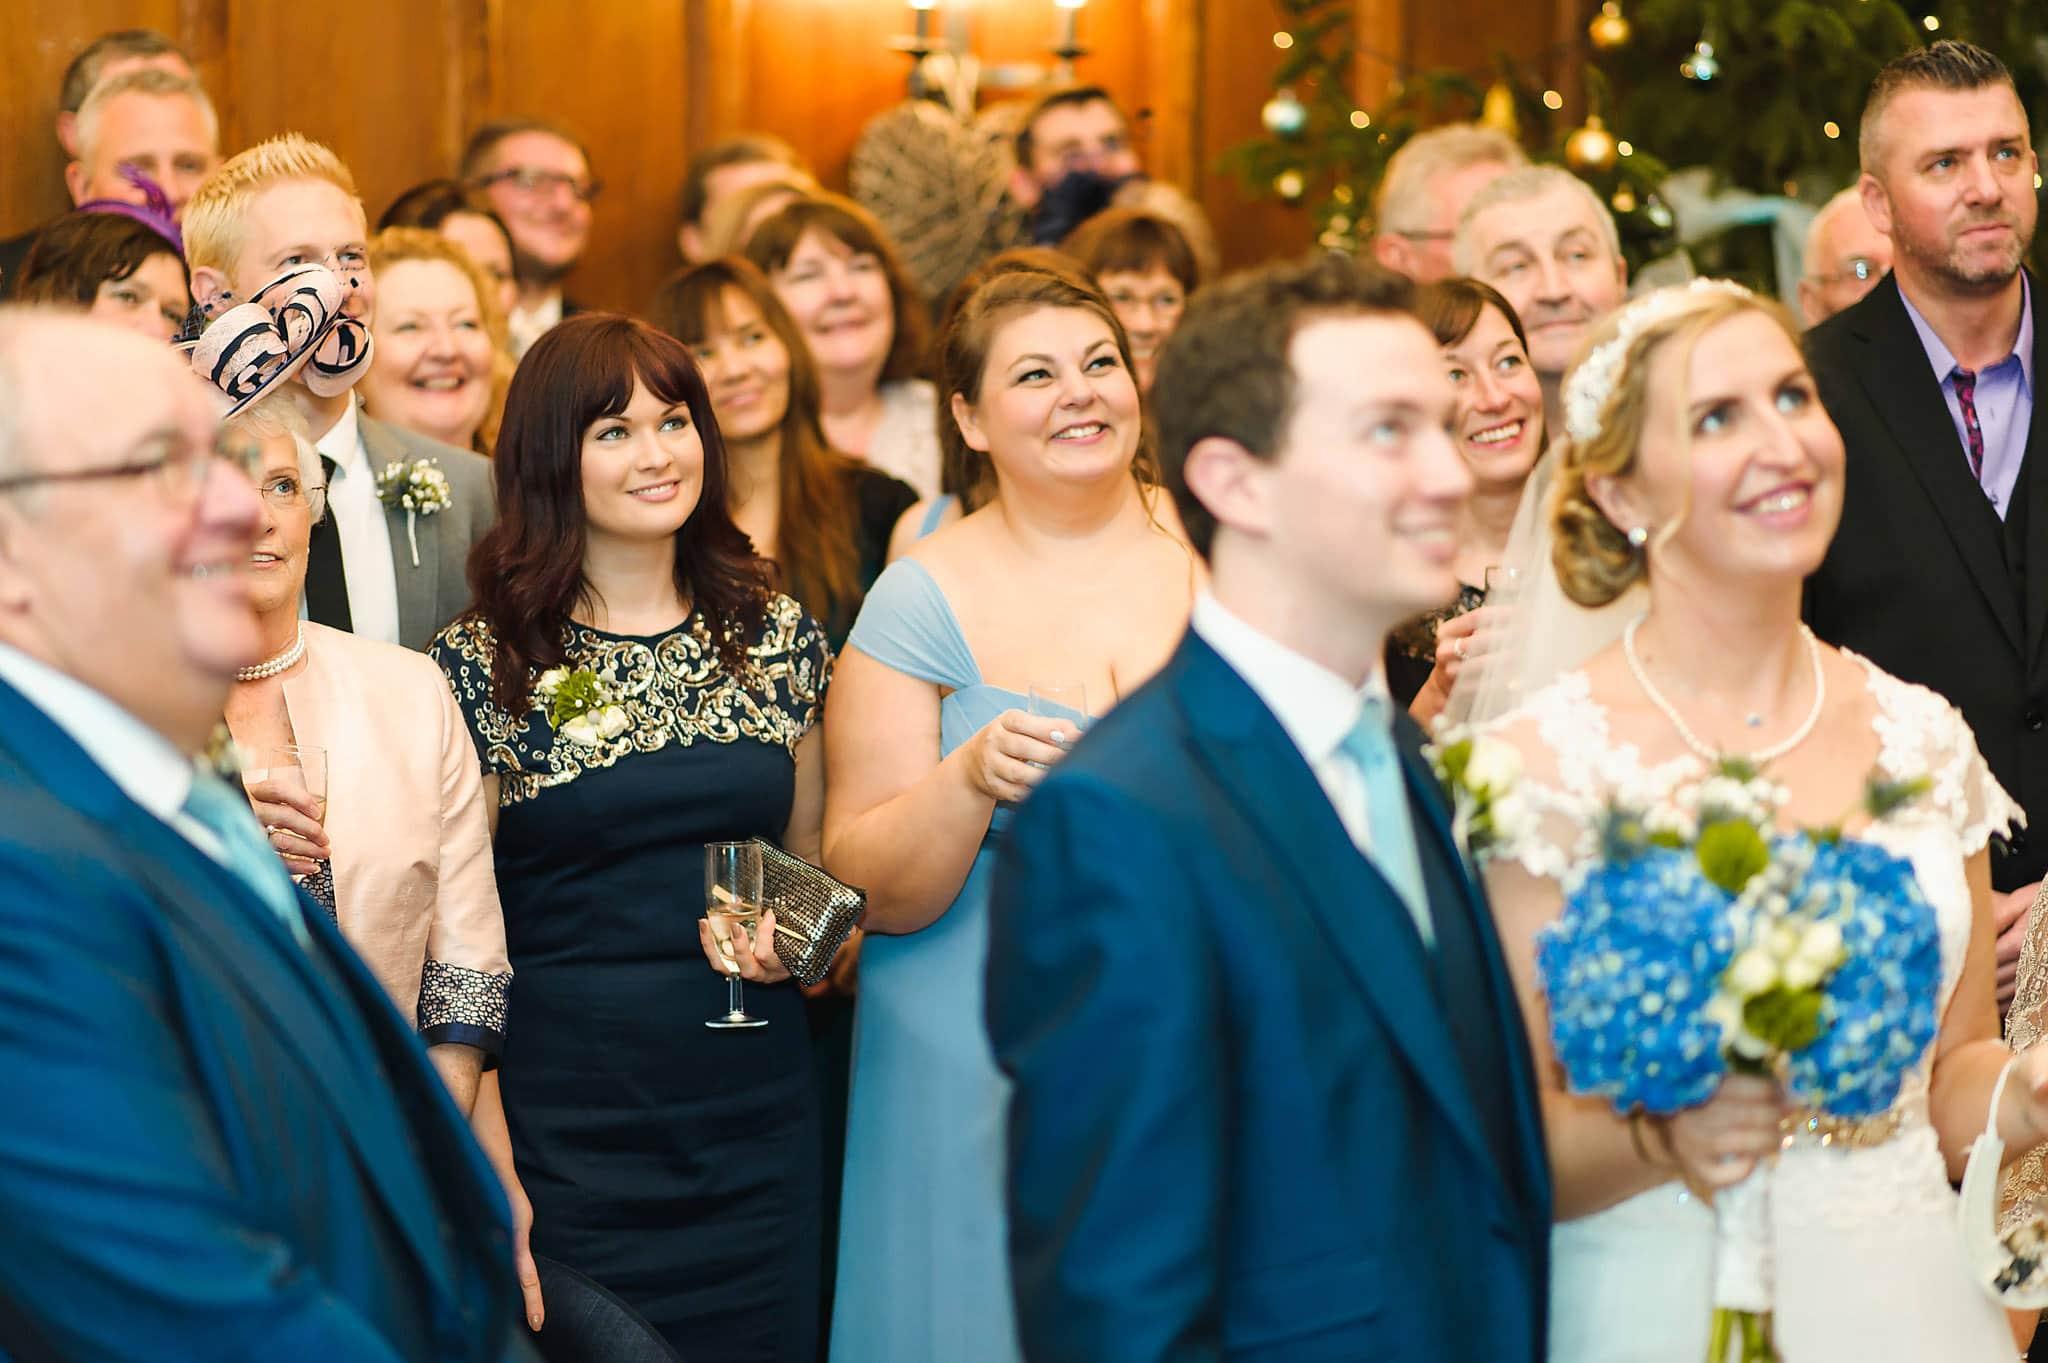 Deer Park Hall - Wedding Photography West Midlands 67